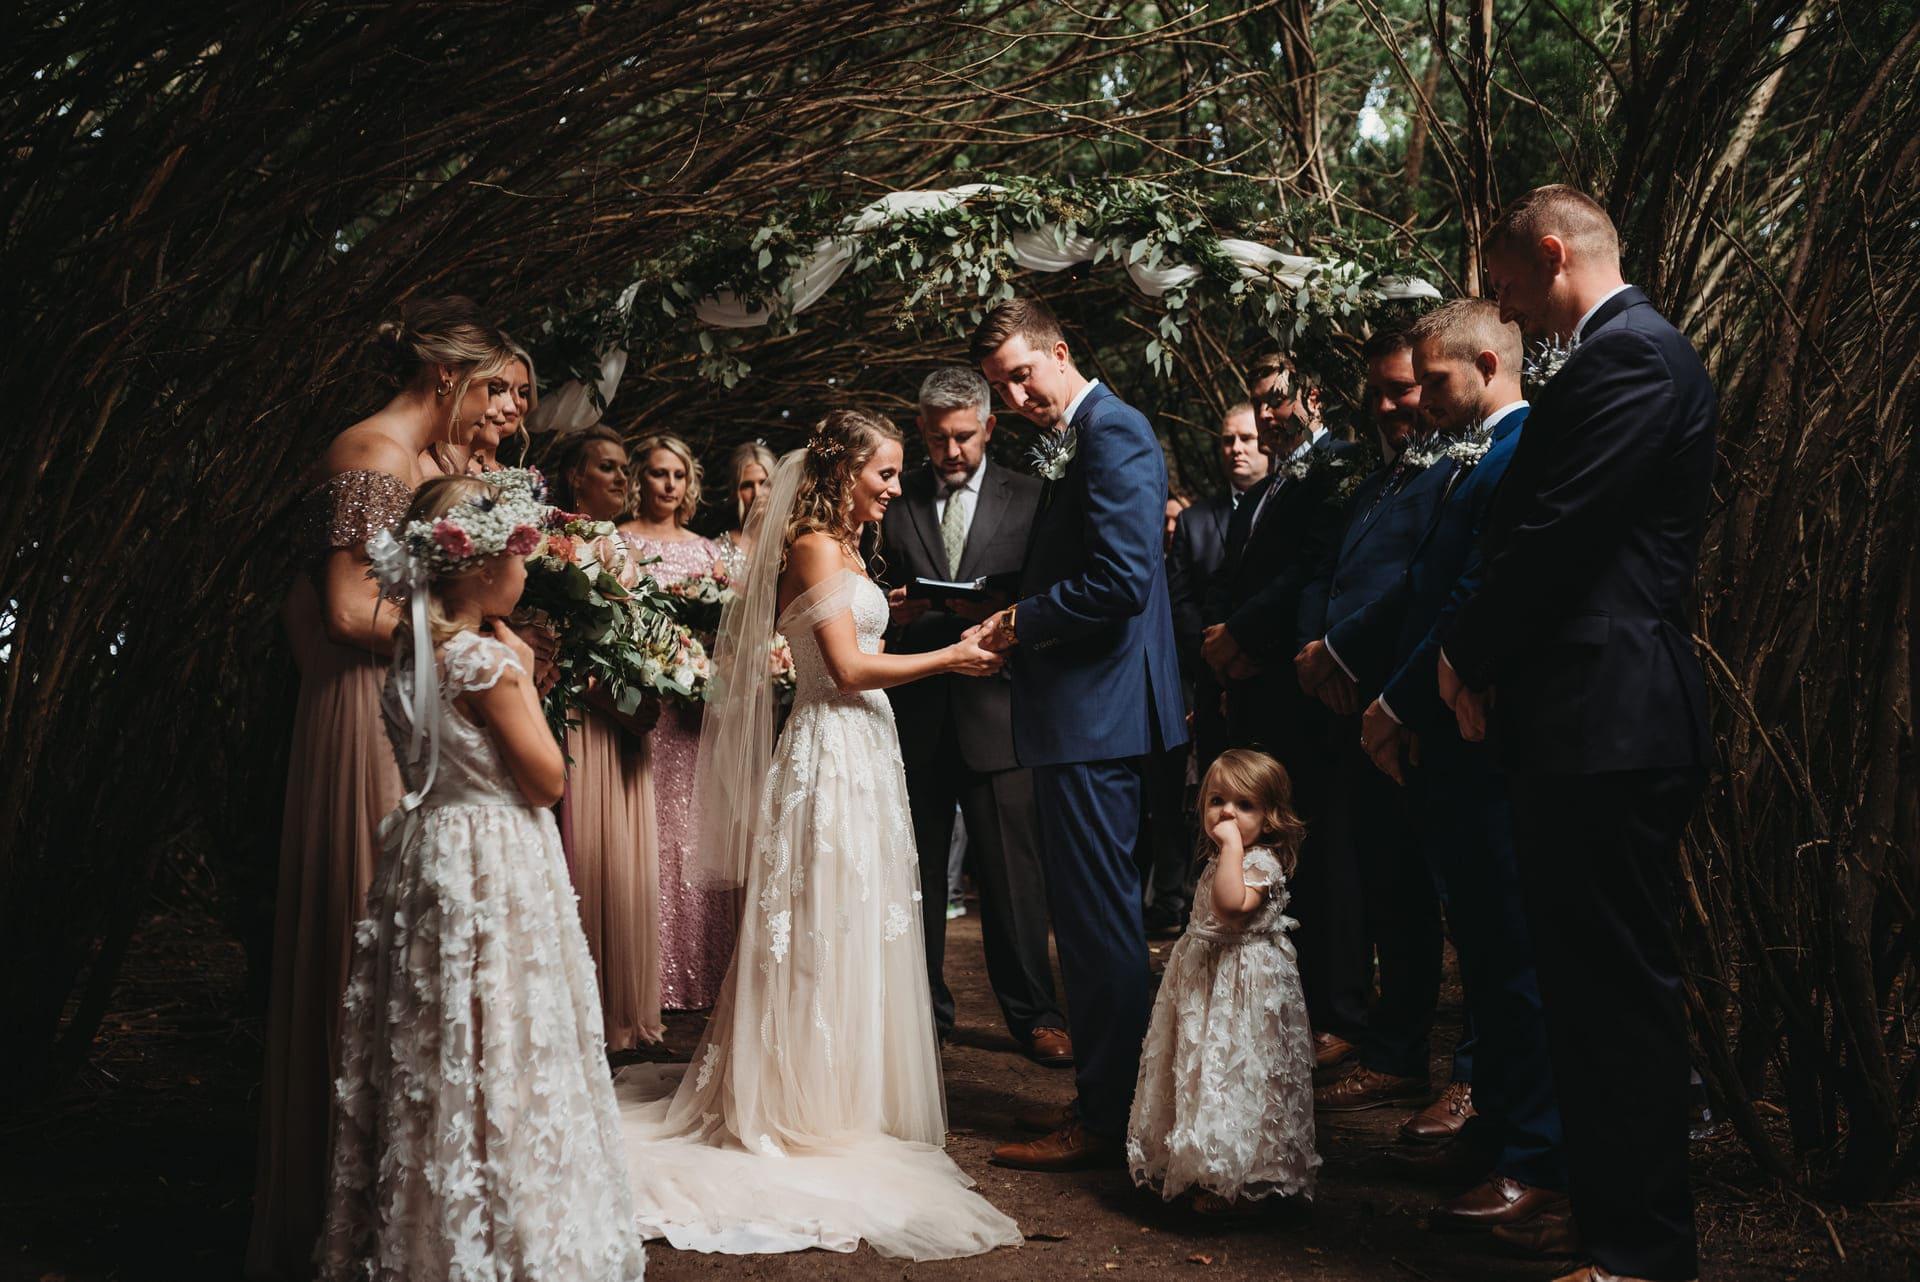 Ceremony Richland Michigan Wedding Photography